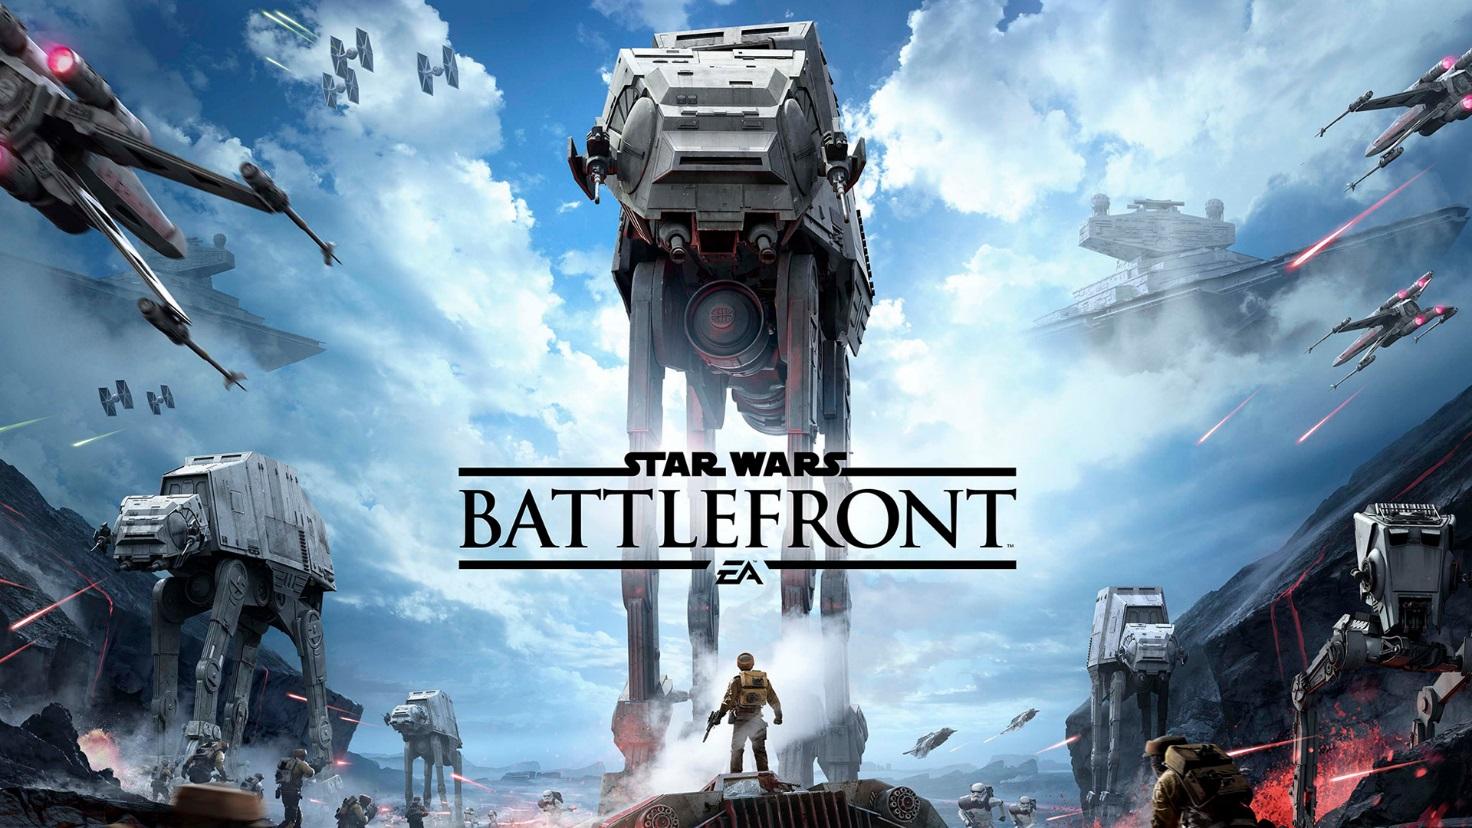 Картинки по запросу Star Wars Battlefront